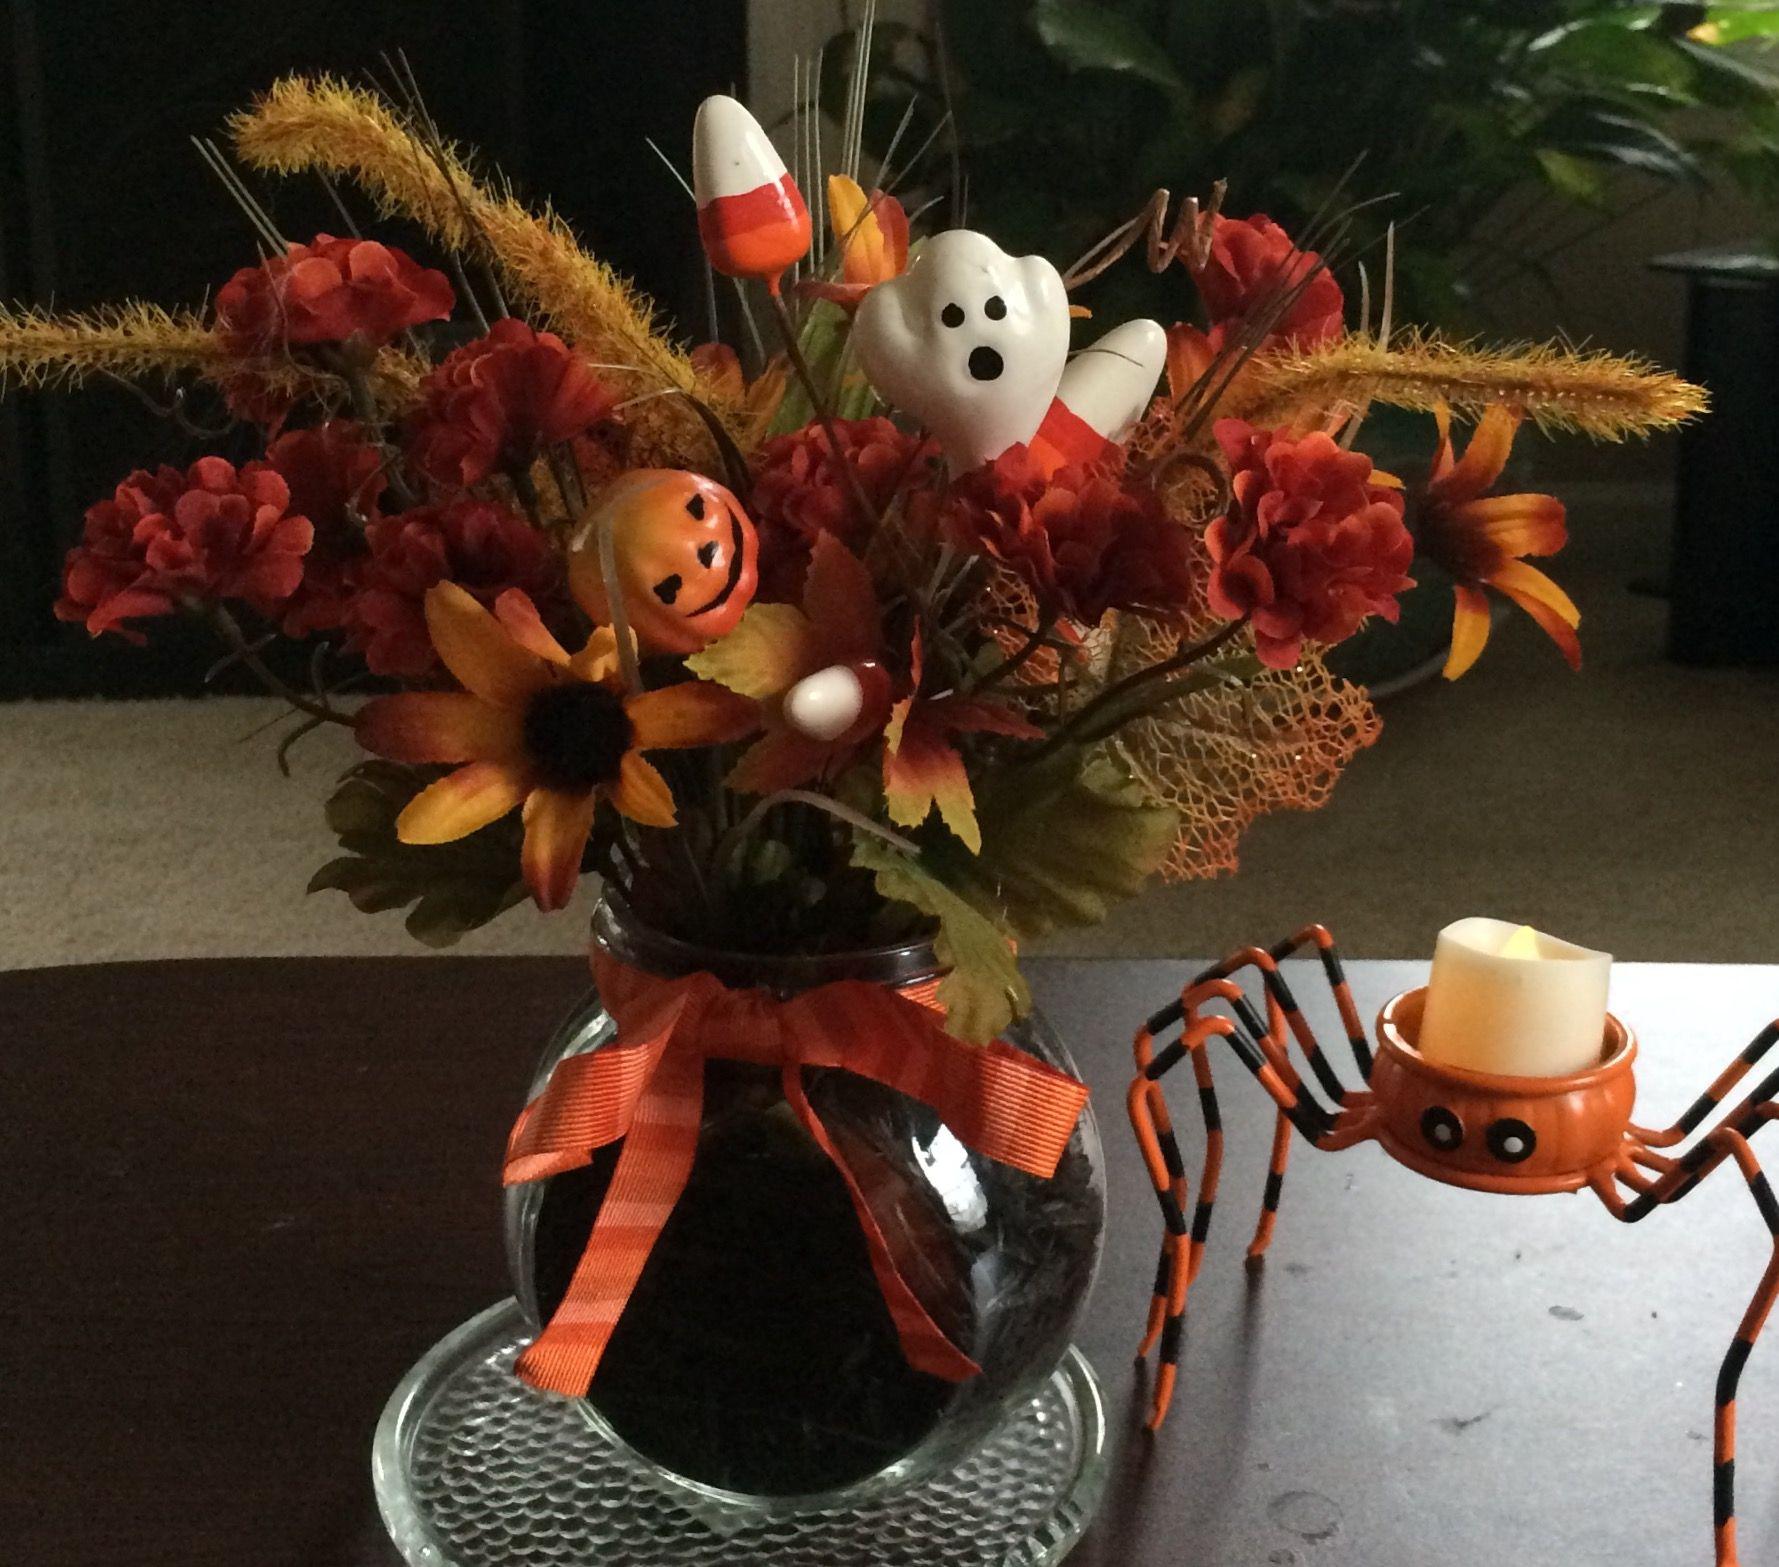 Alwaysadornable fall halloween floral arrangements centerpieces by alwaysadornable fall halloween floral arrangements izmirmasajfo Choice Image